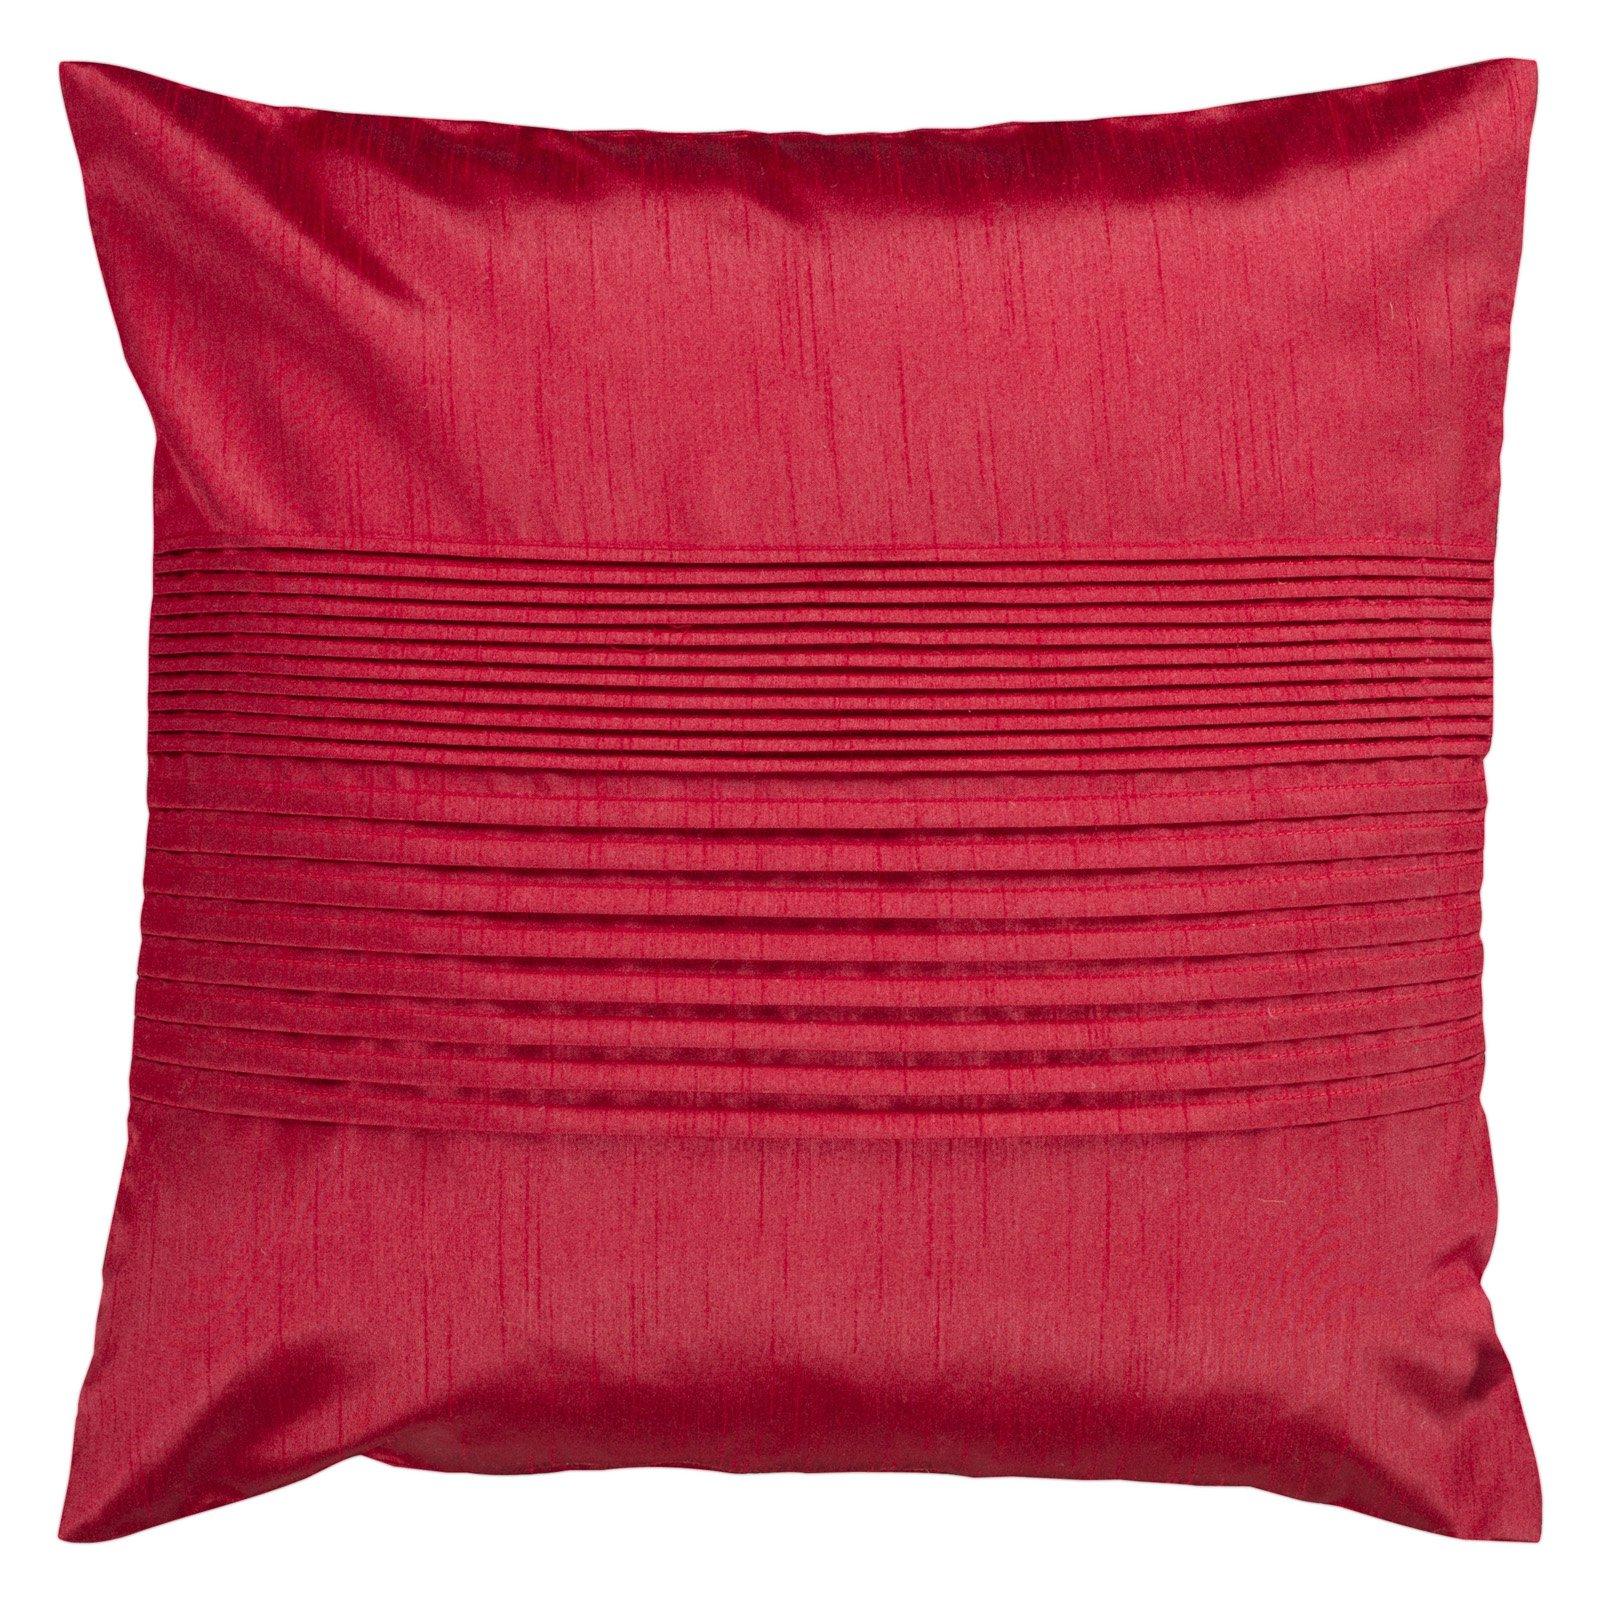 Surya Tracks Decorative Pillow - Red